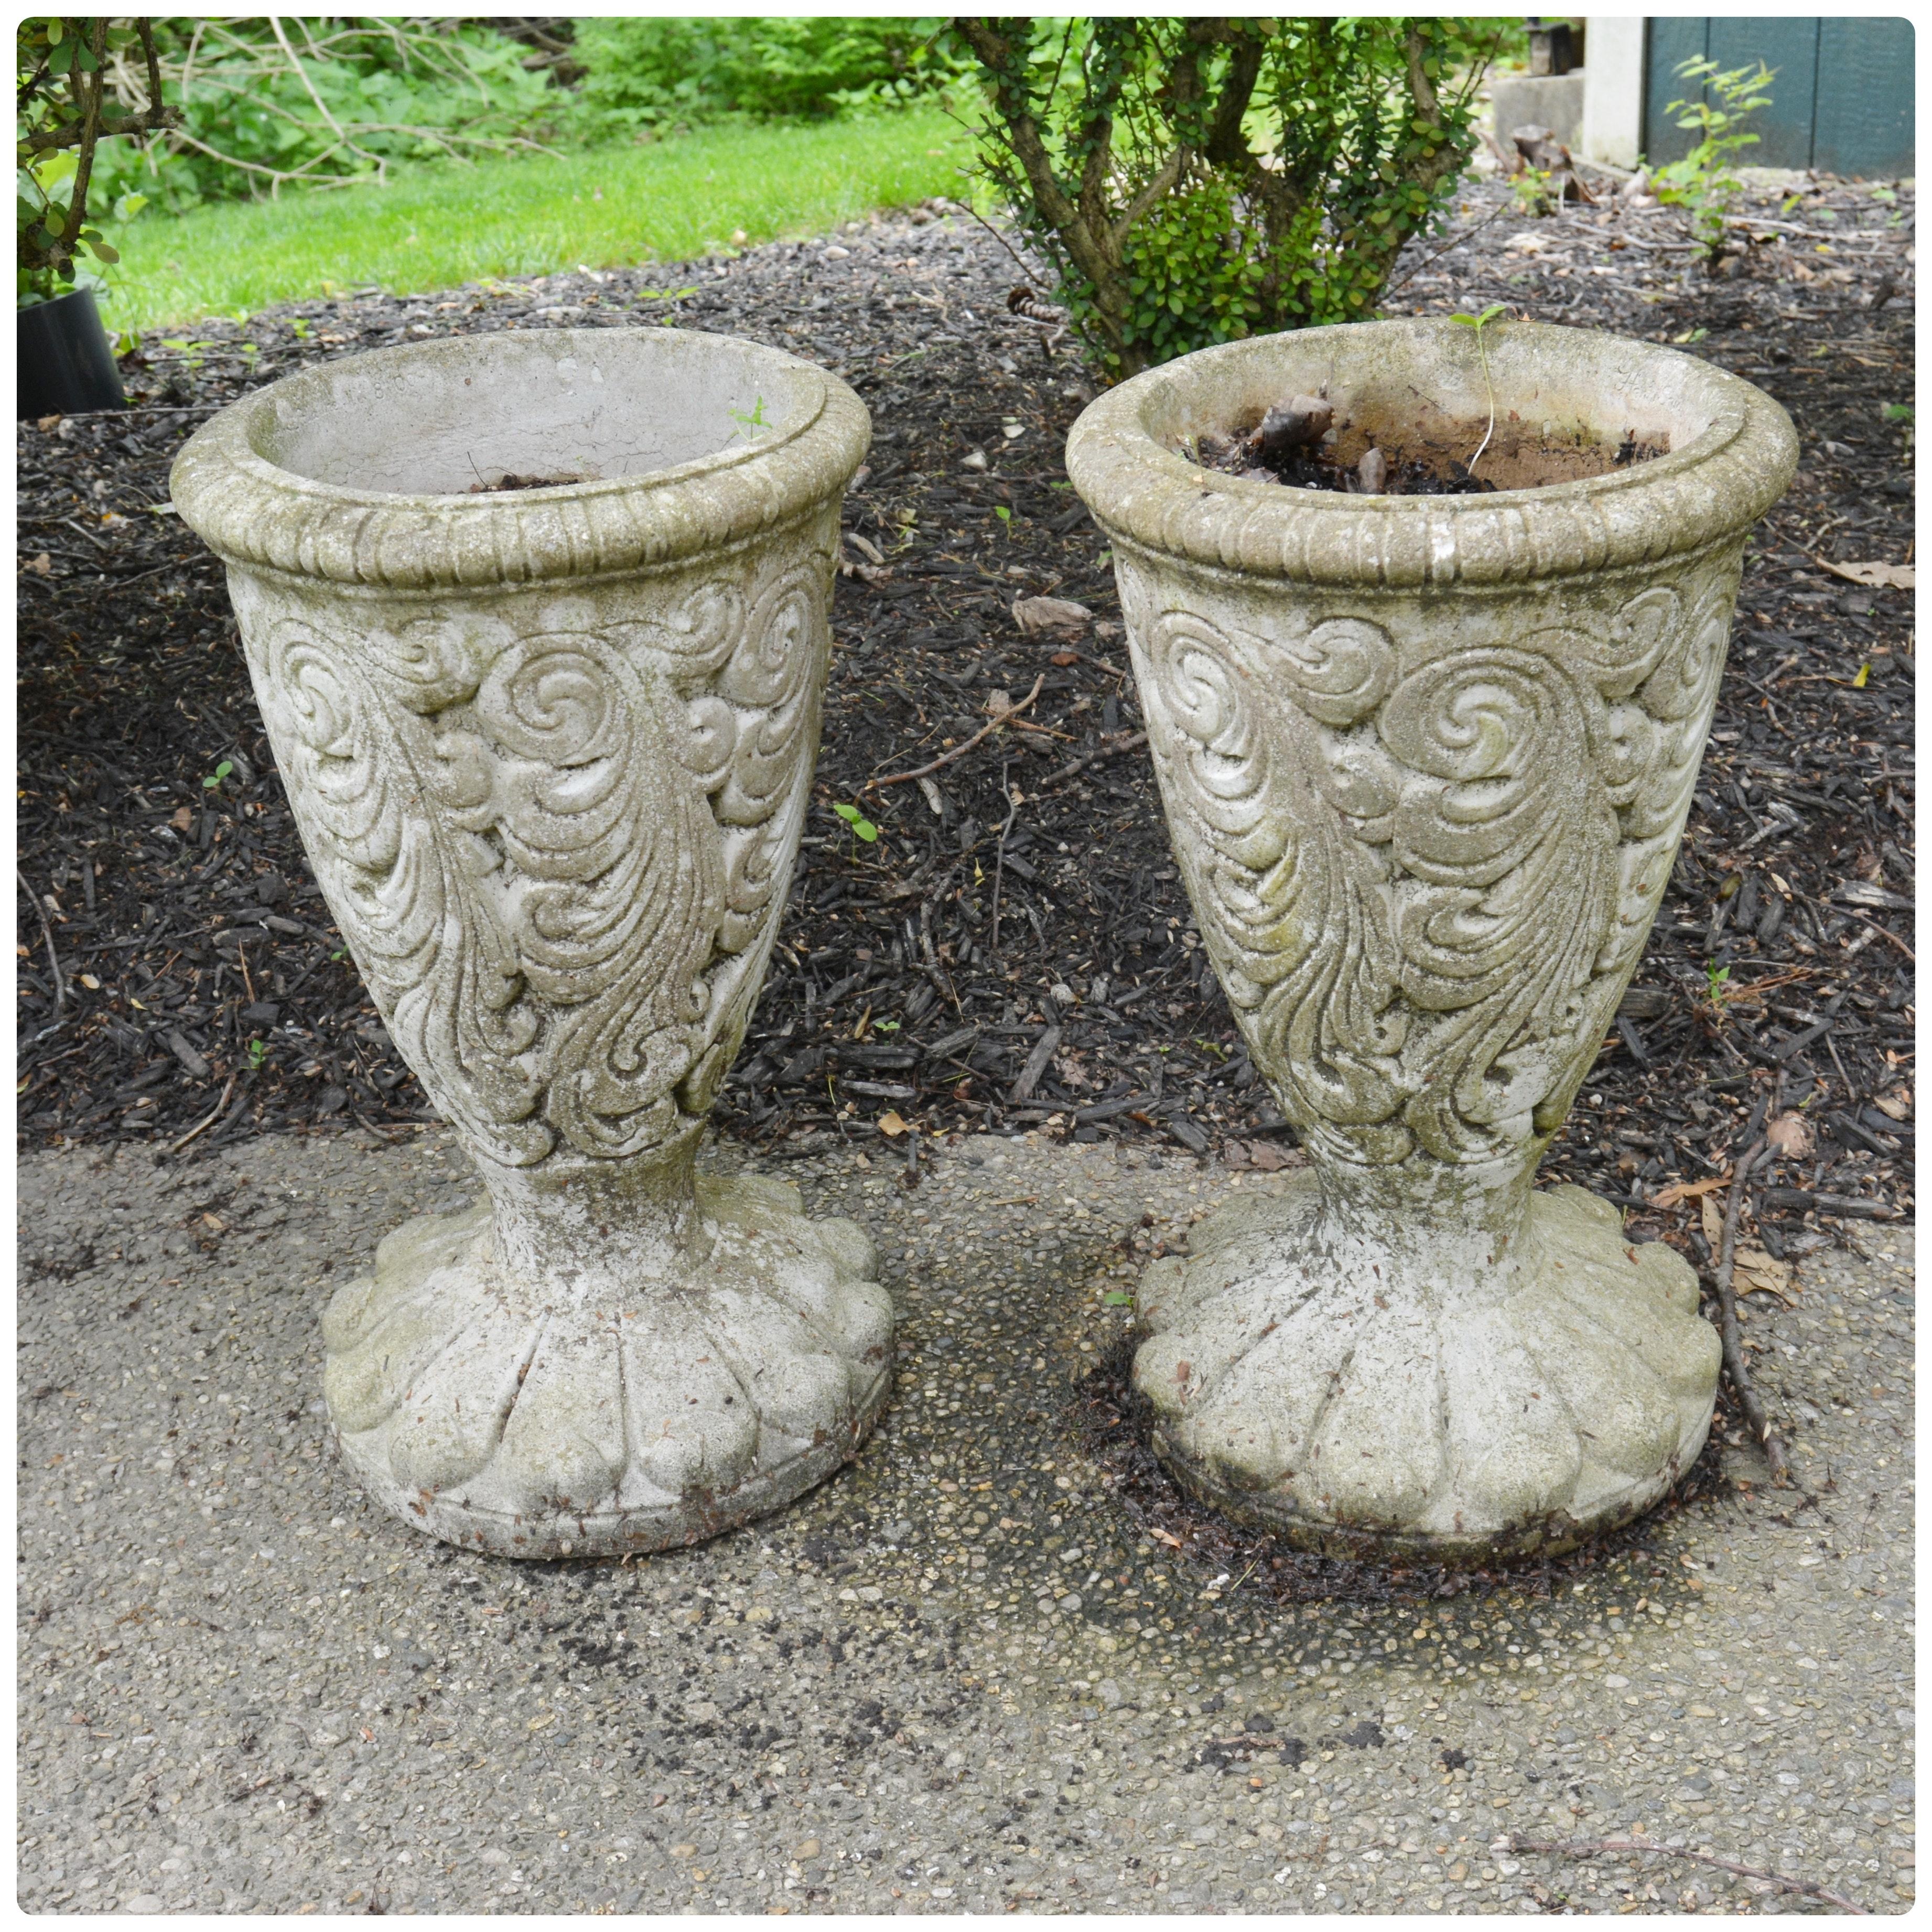 Pair of Embossed Concrete Planters